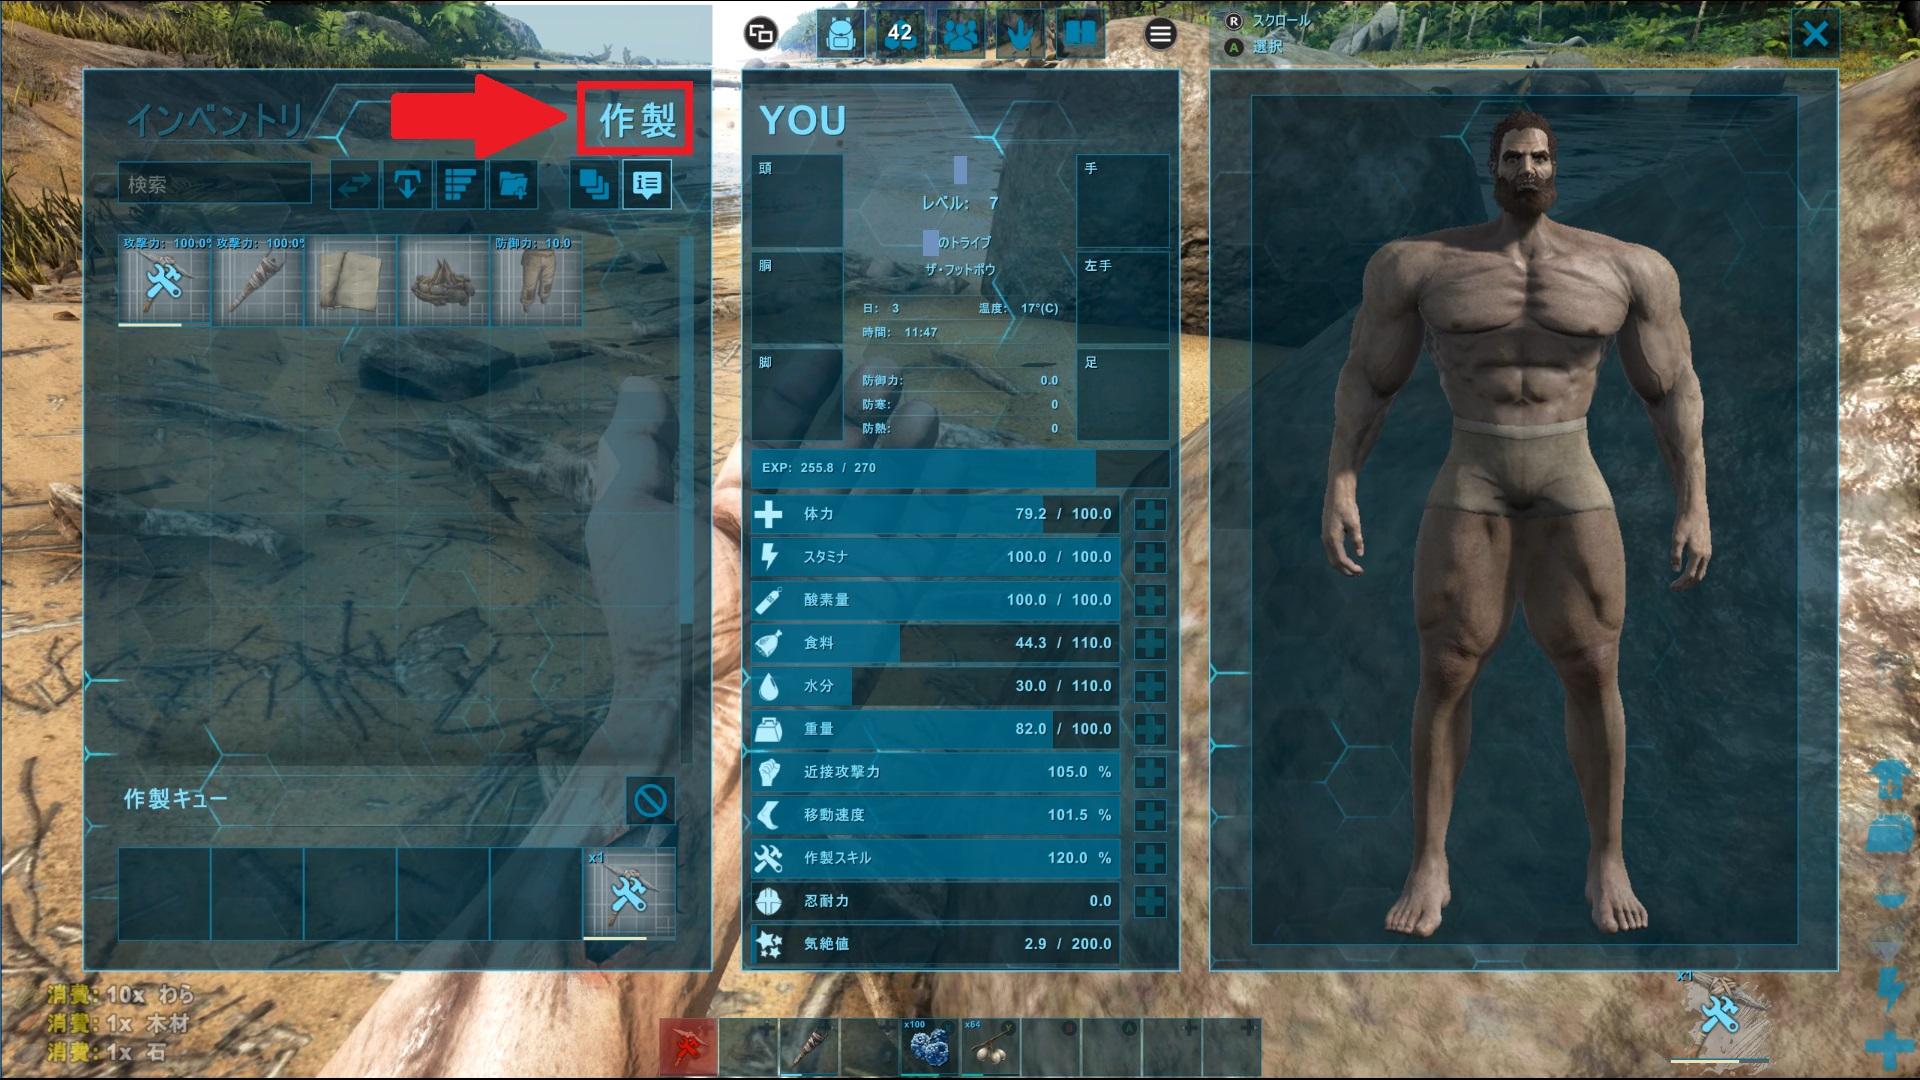 c6ceb5e8e442764f1eeb142881190010 - 【ARK Survival Evolved】序盤攻略【究極の恐竜時代を生き抜く!】